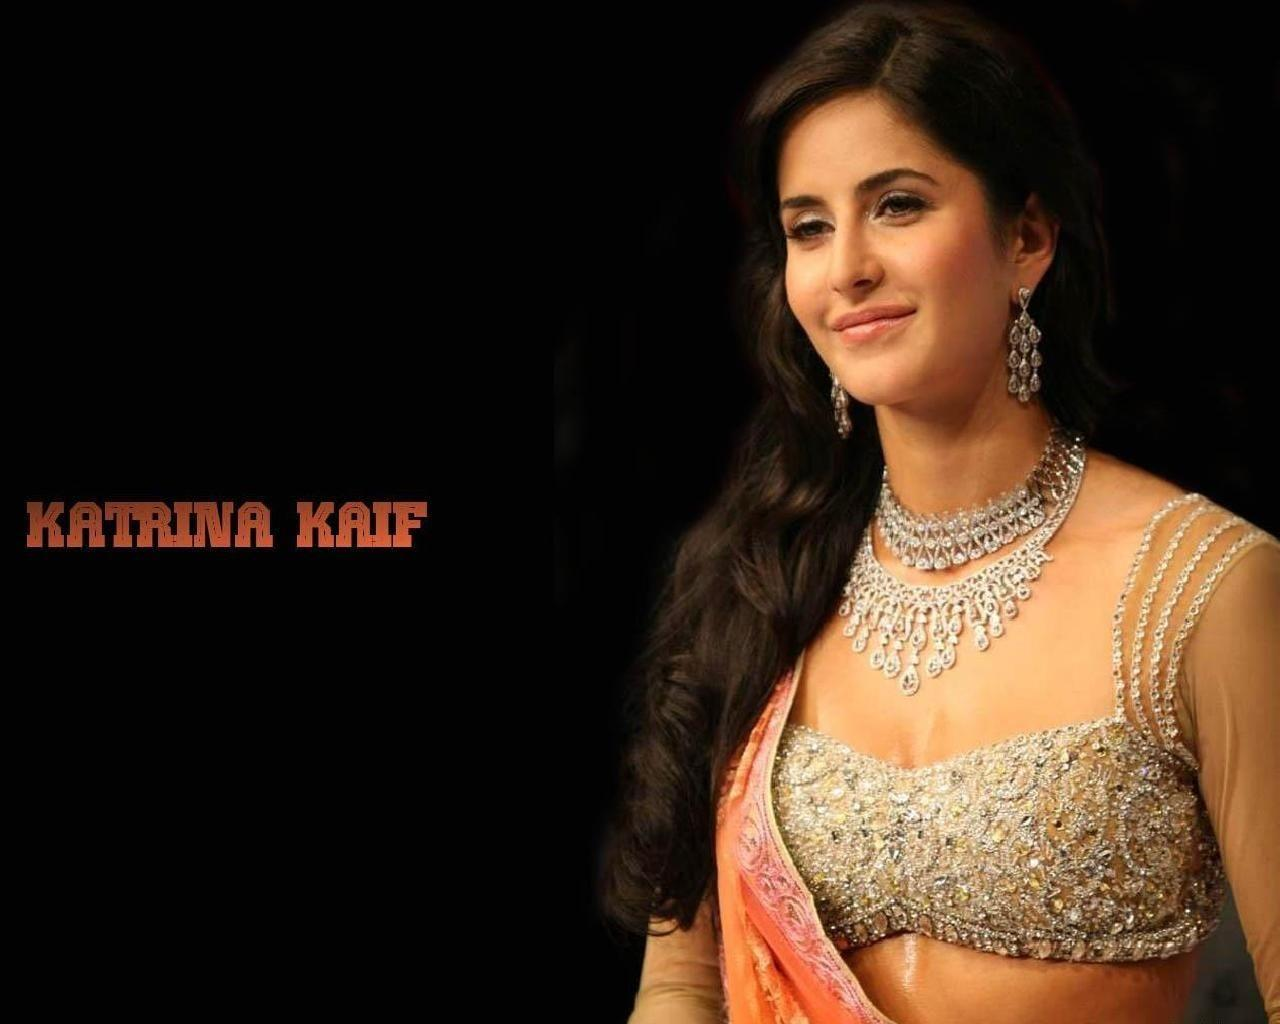 Bollywood Actresses News, Pictures, Videos Katrina Kaif News-8749